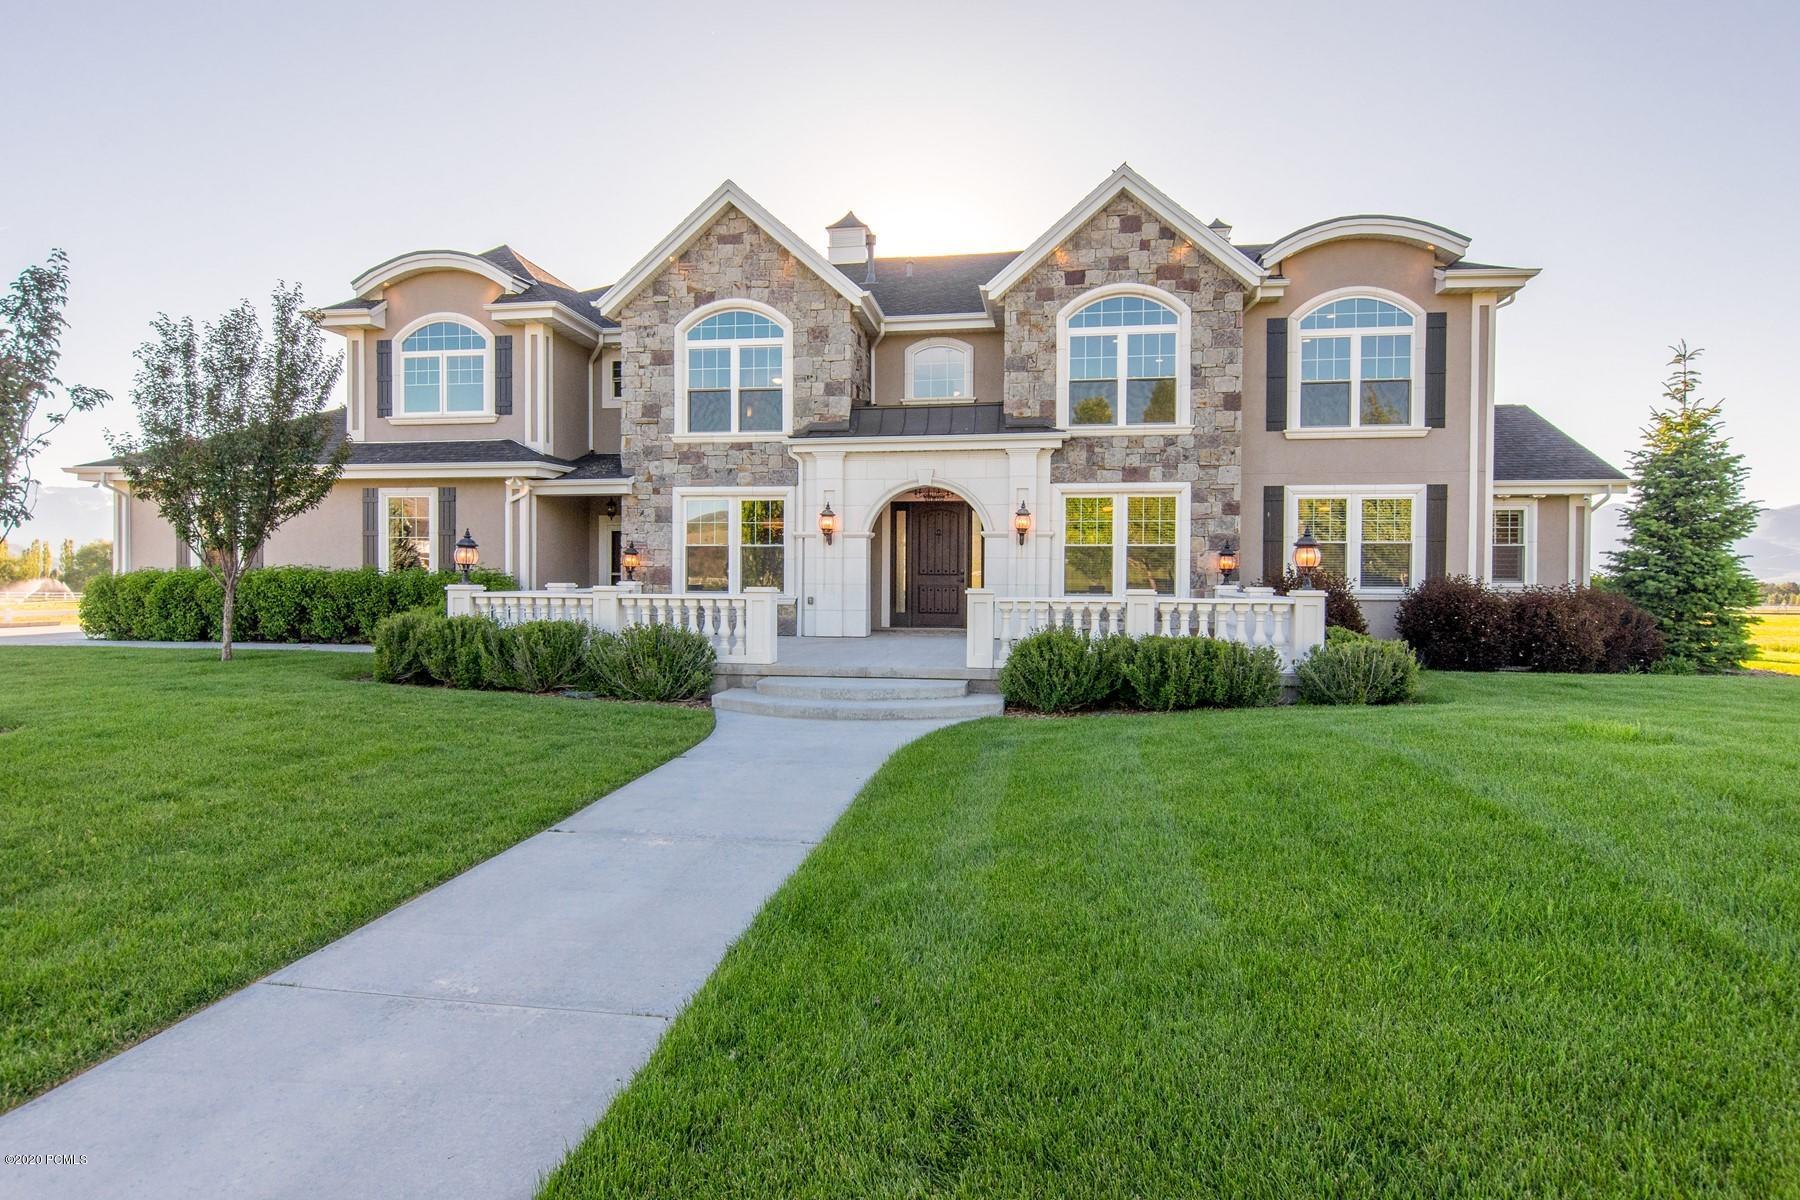 1911 Creekside Drive, Heber City, Utah 84032, 4 Bedrooms Bedrooms, ,5 BathroomsBathrooms,Single Family,For Sale,Creekside,12002677